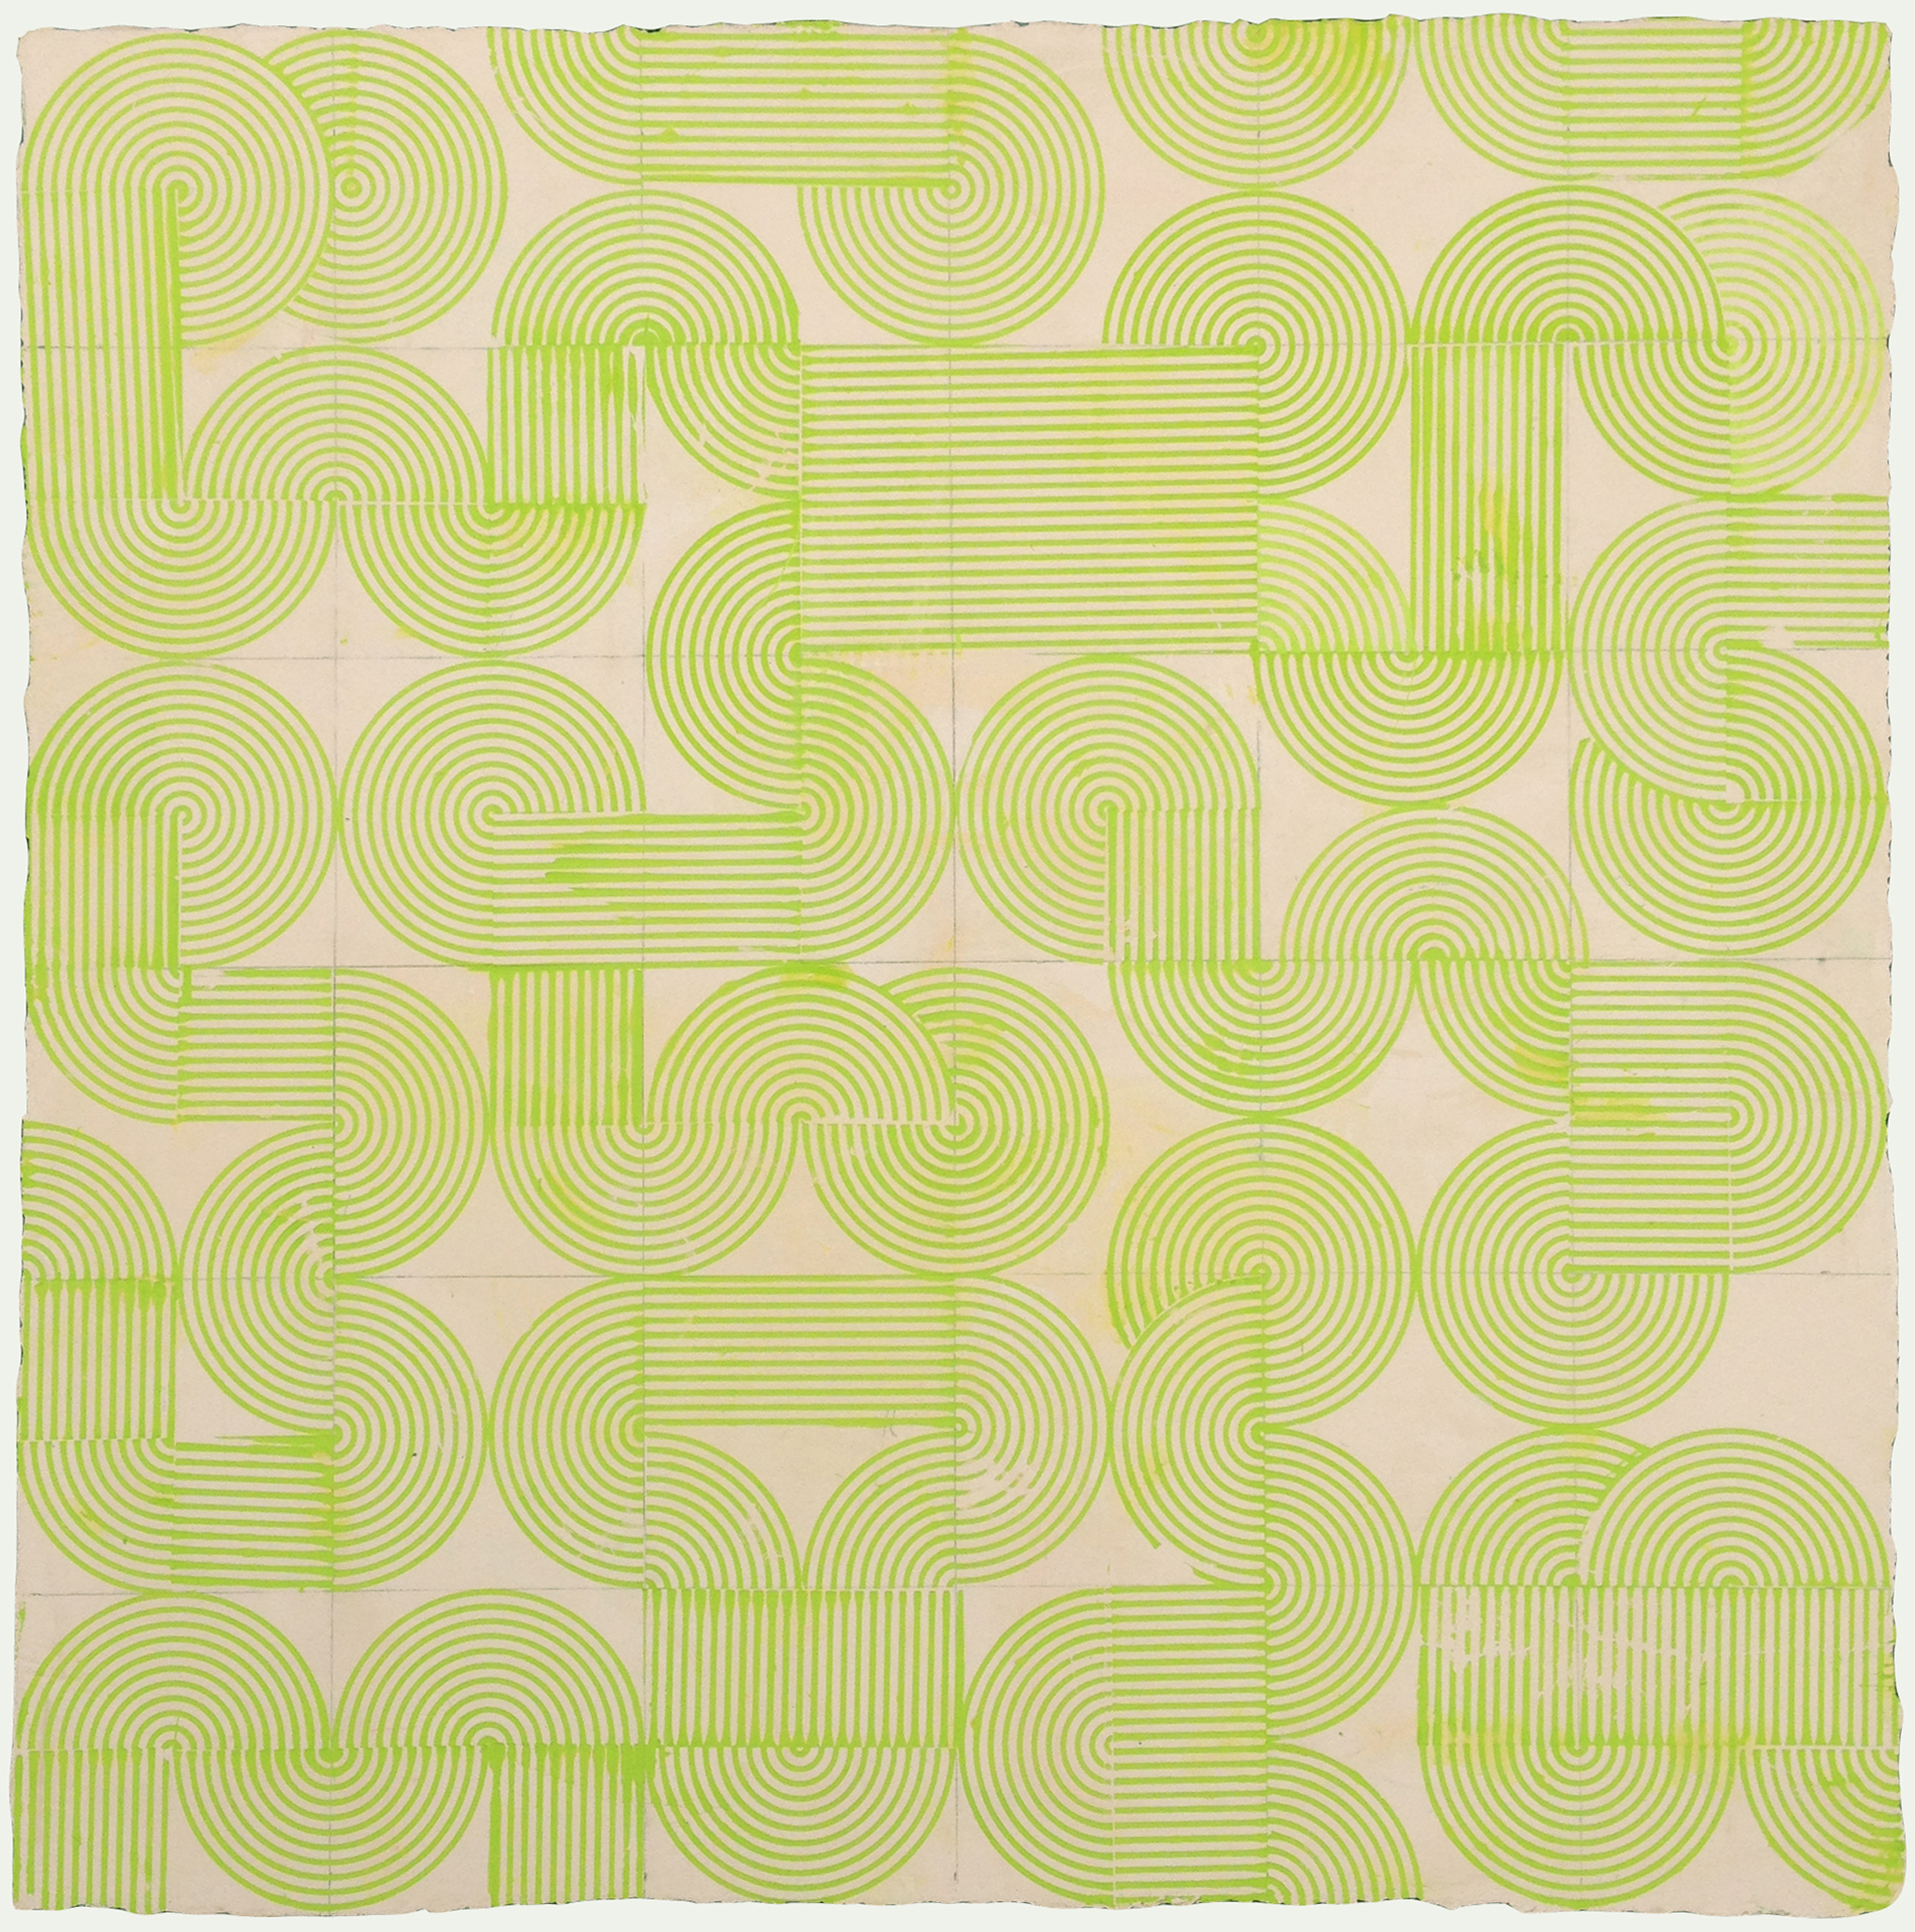 "ELISE FERGUSON   Dial It , pigmented plaster on MDF panel, 24"" x 24"", 2014"